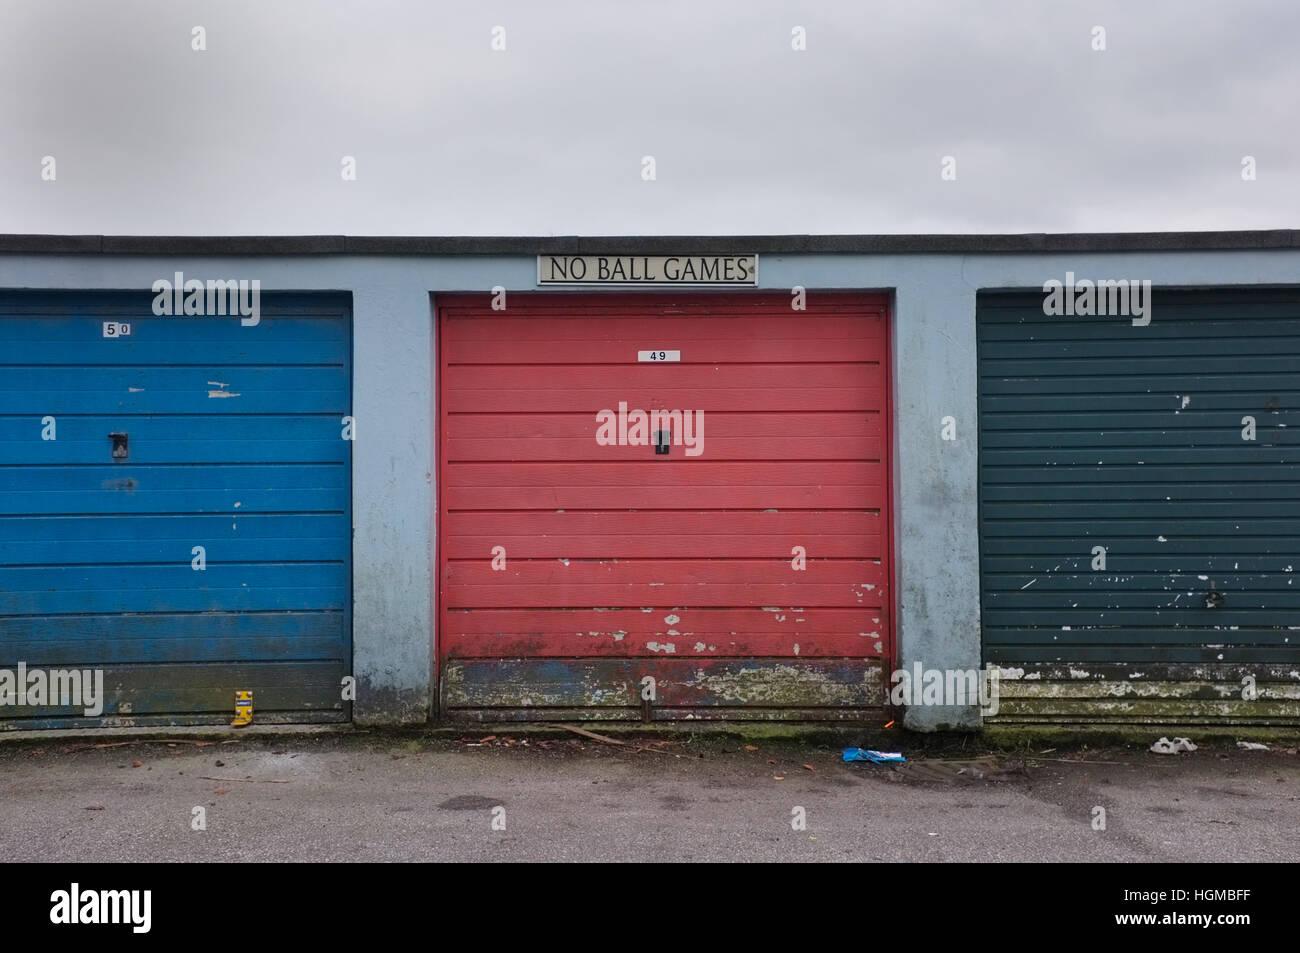 Cerradura para garajes Imagen De Stock